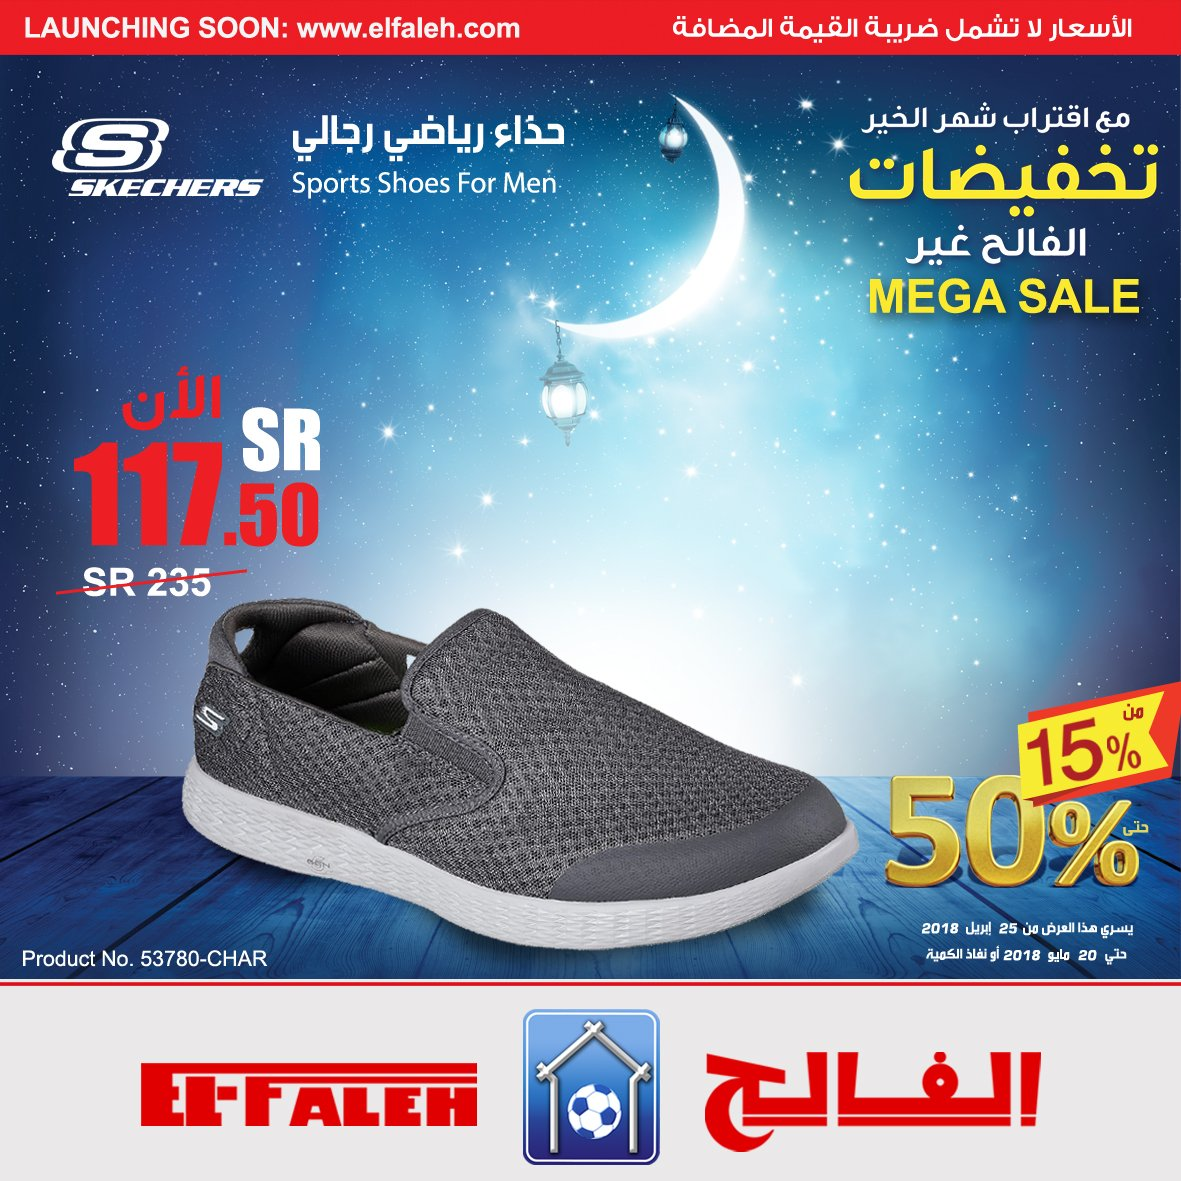 0acb89d79 تشكيلة رجالية أحذية #سكتشرز #skechers ضمن #تخفيضات الفالح الشاملة من 15%  حتى 50% #الفالحpic.twitter.com/IzPFCrPNU2